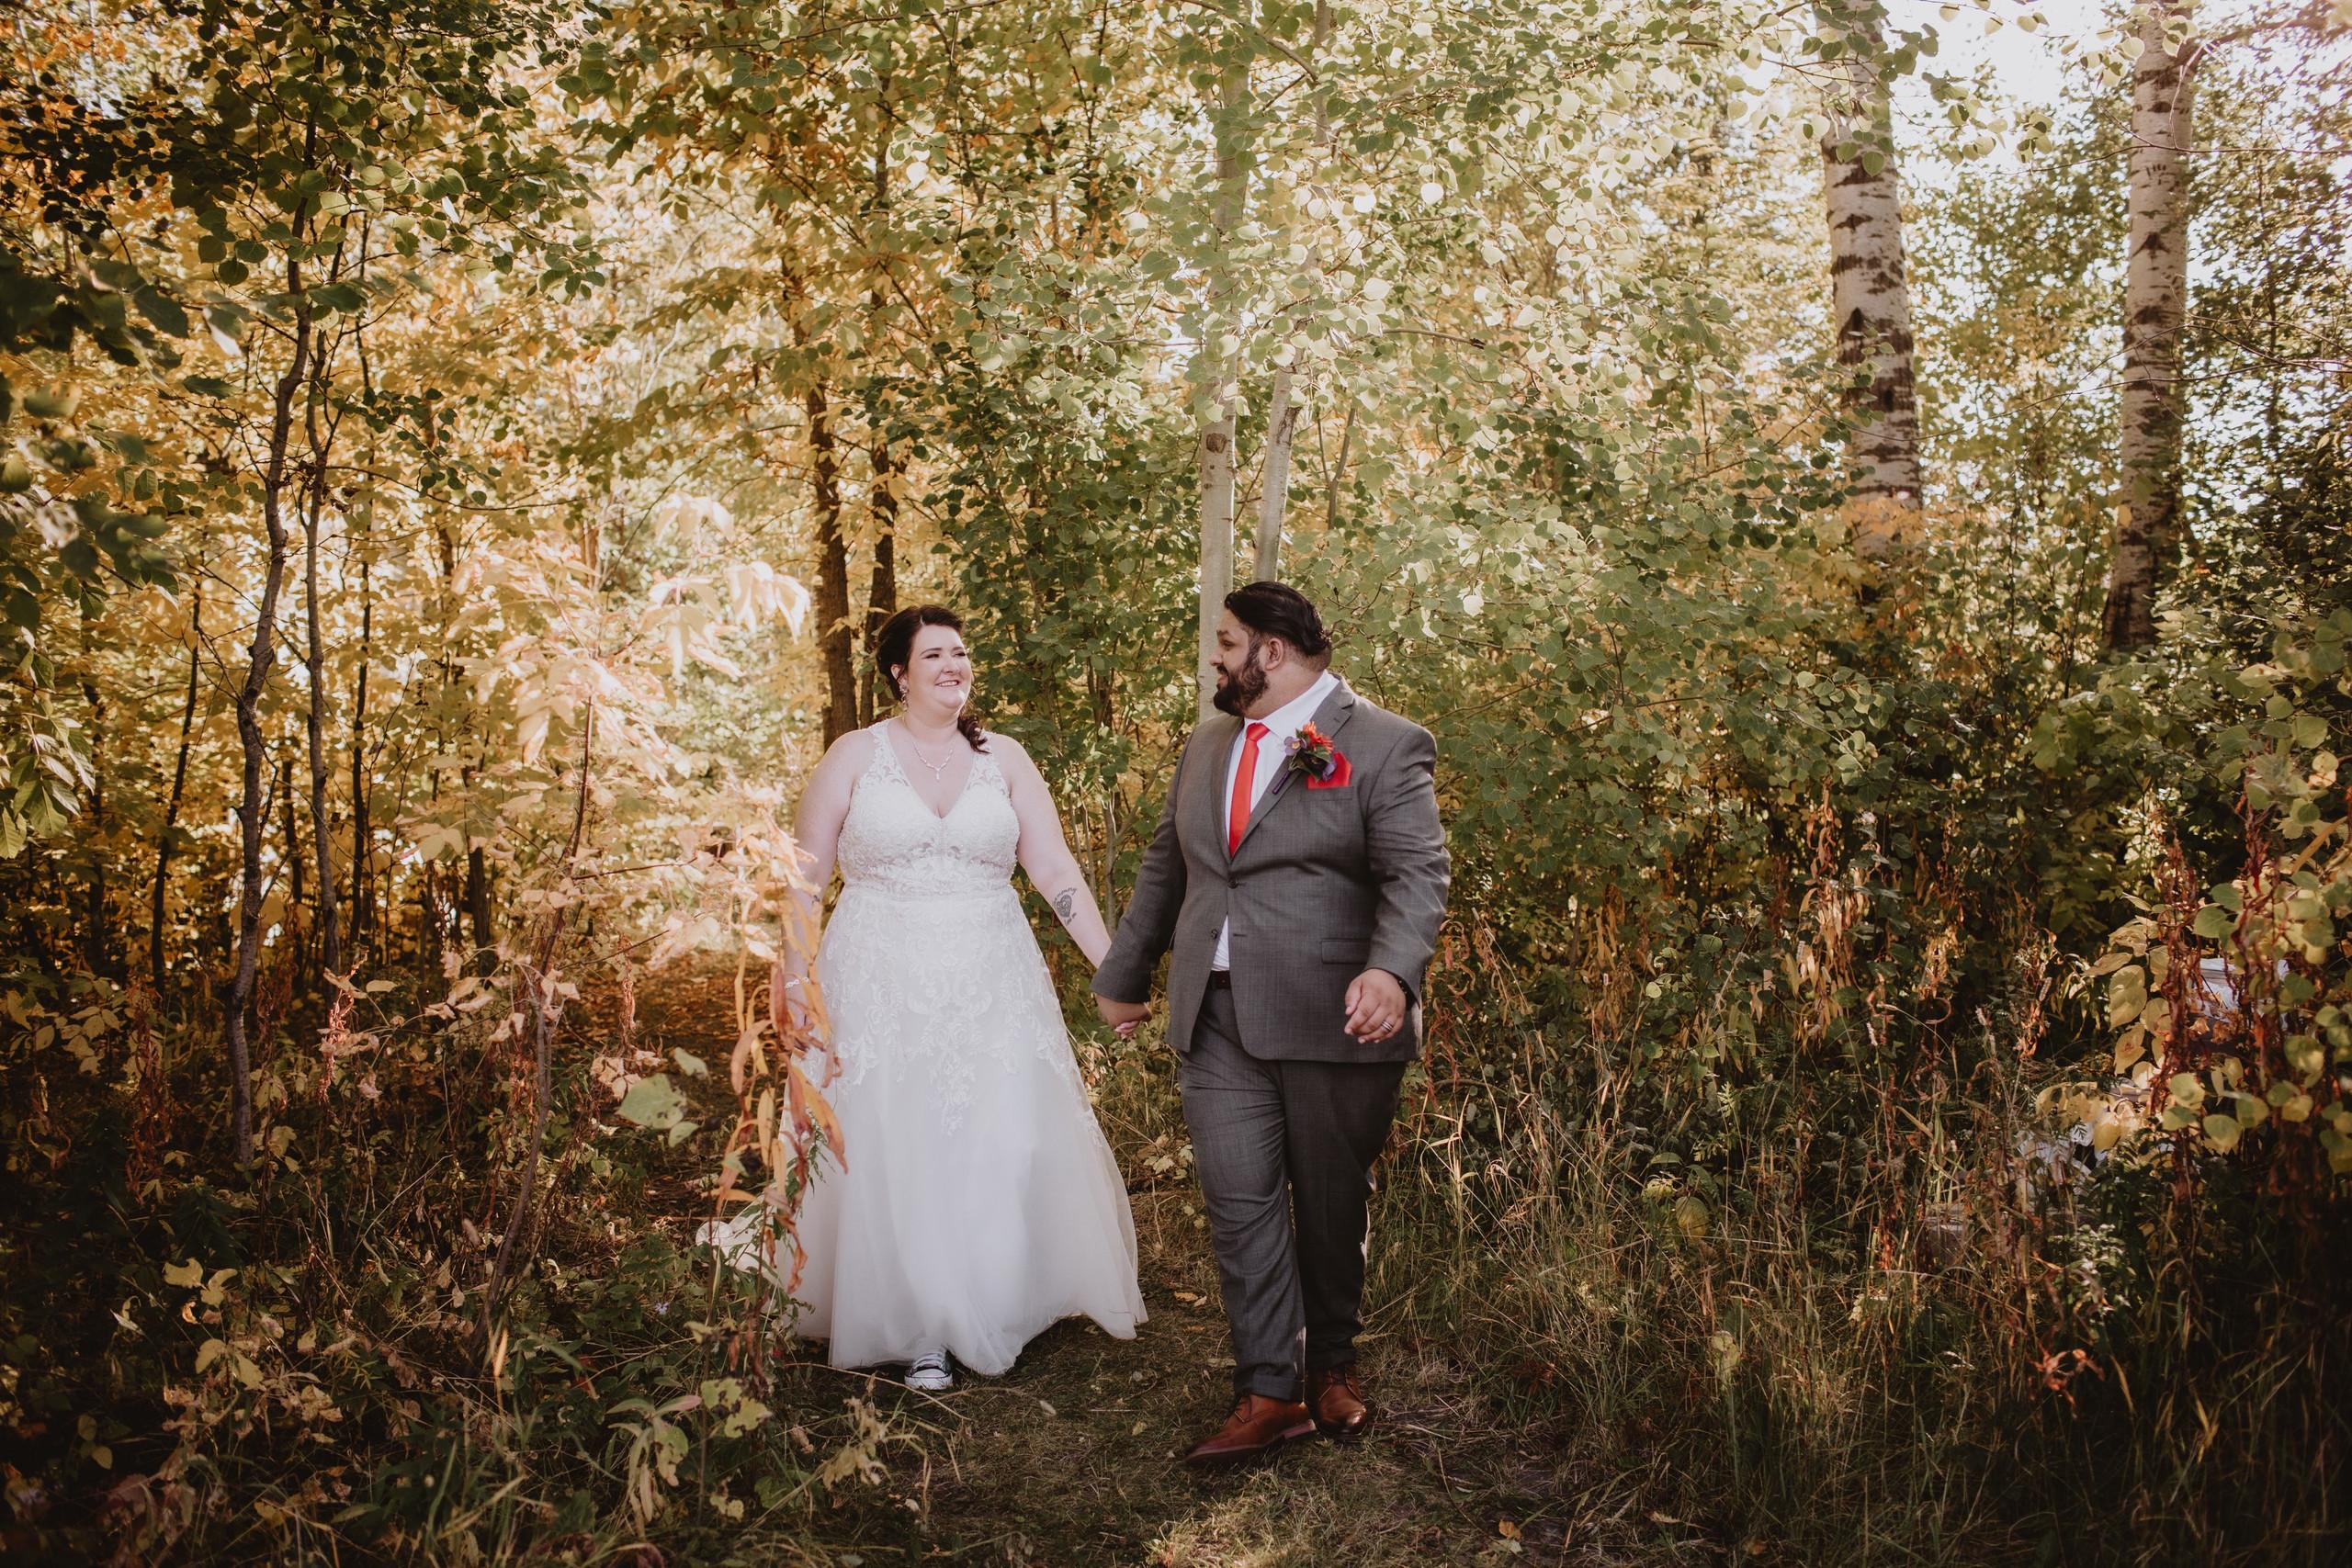 Manitoba Wedding Couple walks through forest during golden hour wedding photos.